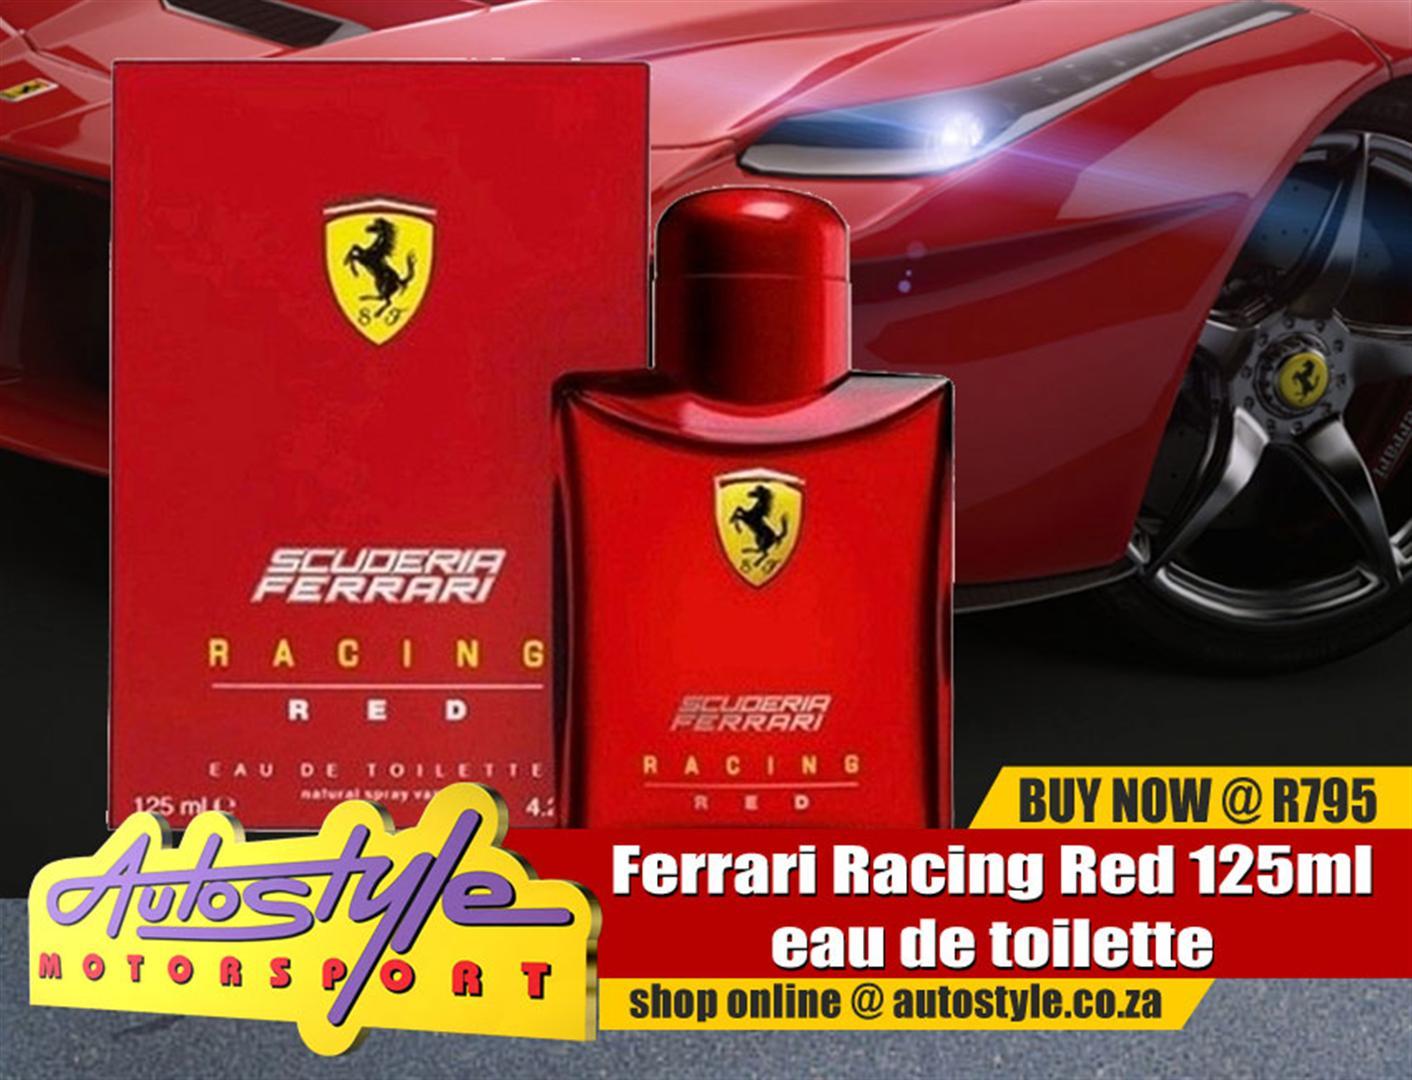 Ferrari Racing Red 125ml eau de toilette